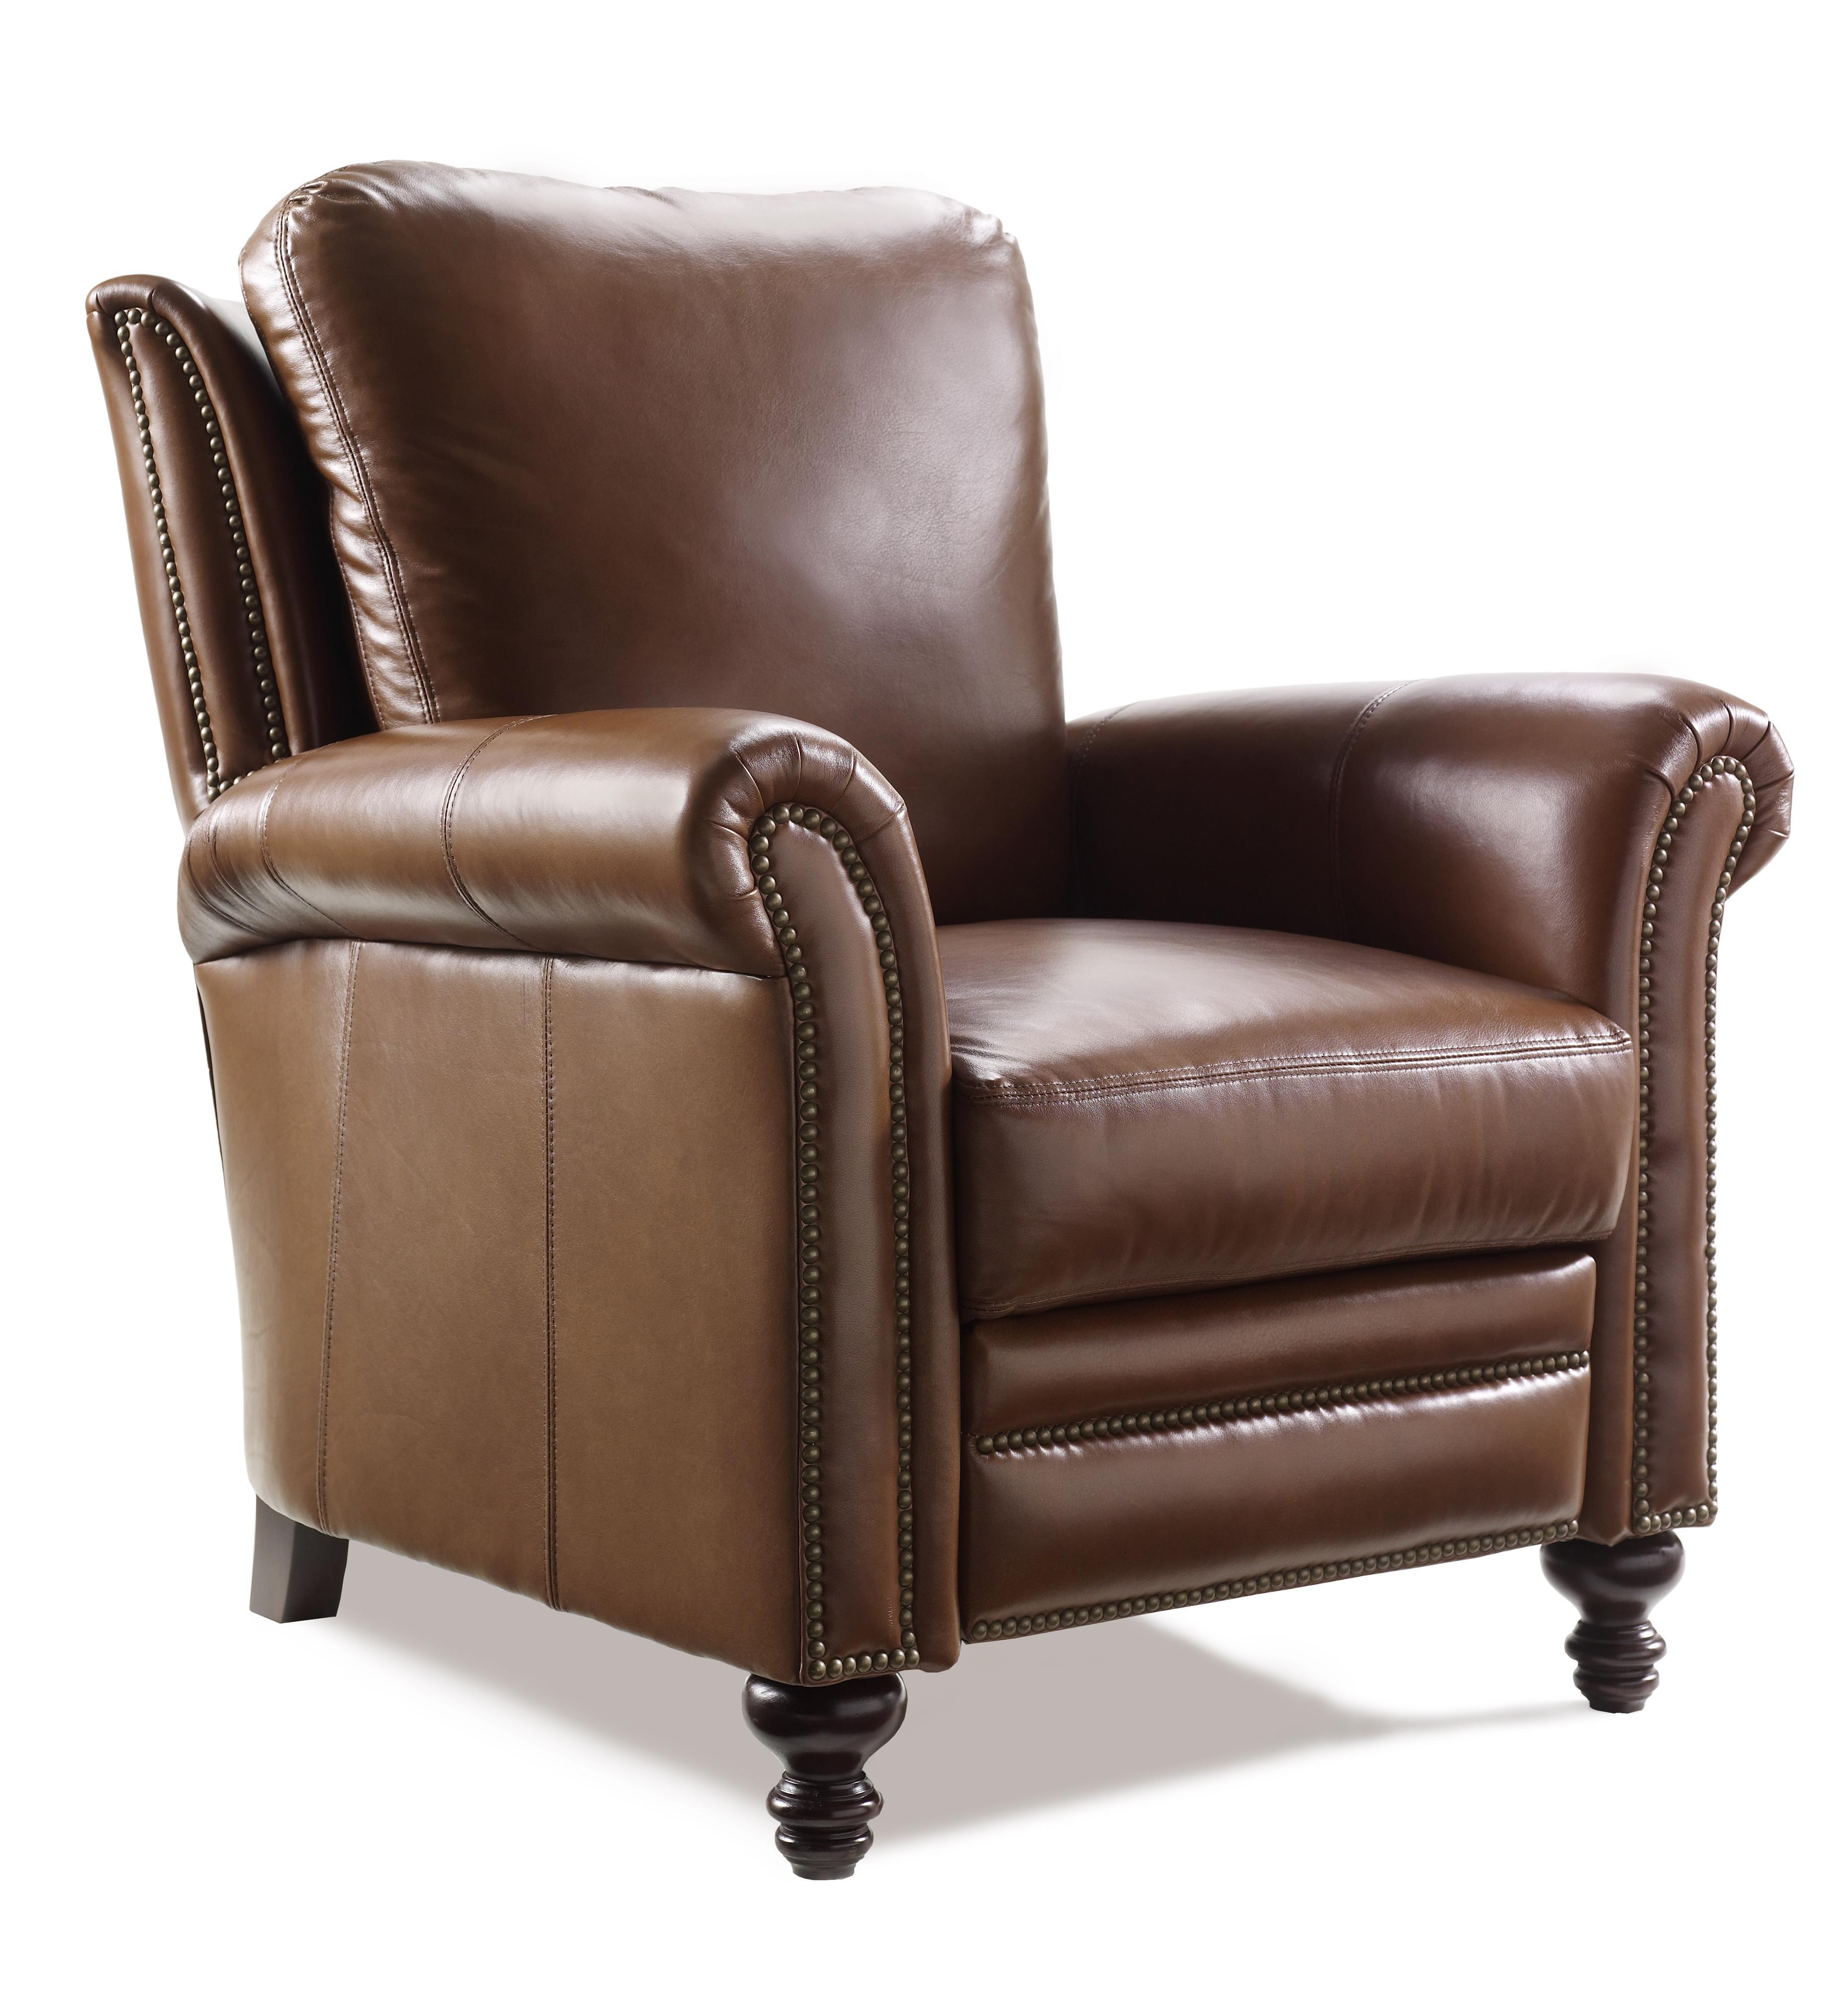 Bradington Young Richardson High Leg Lounger Sprintz Furniture Recliner Nashville Franklin And Greater Tennessee